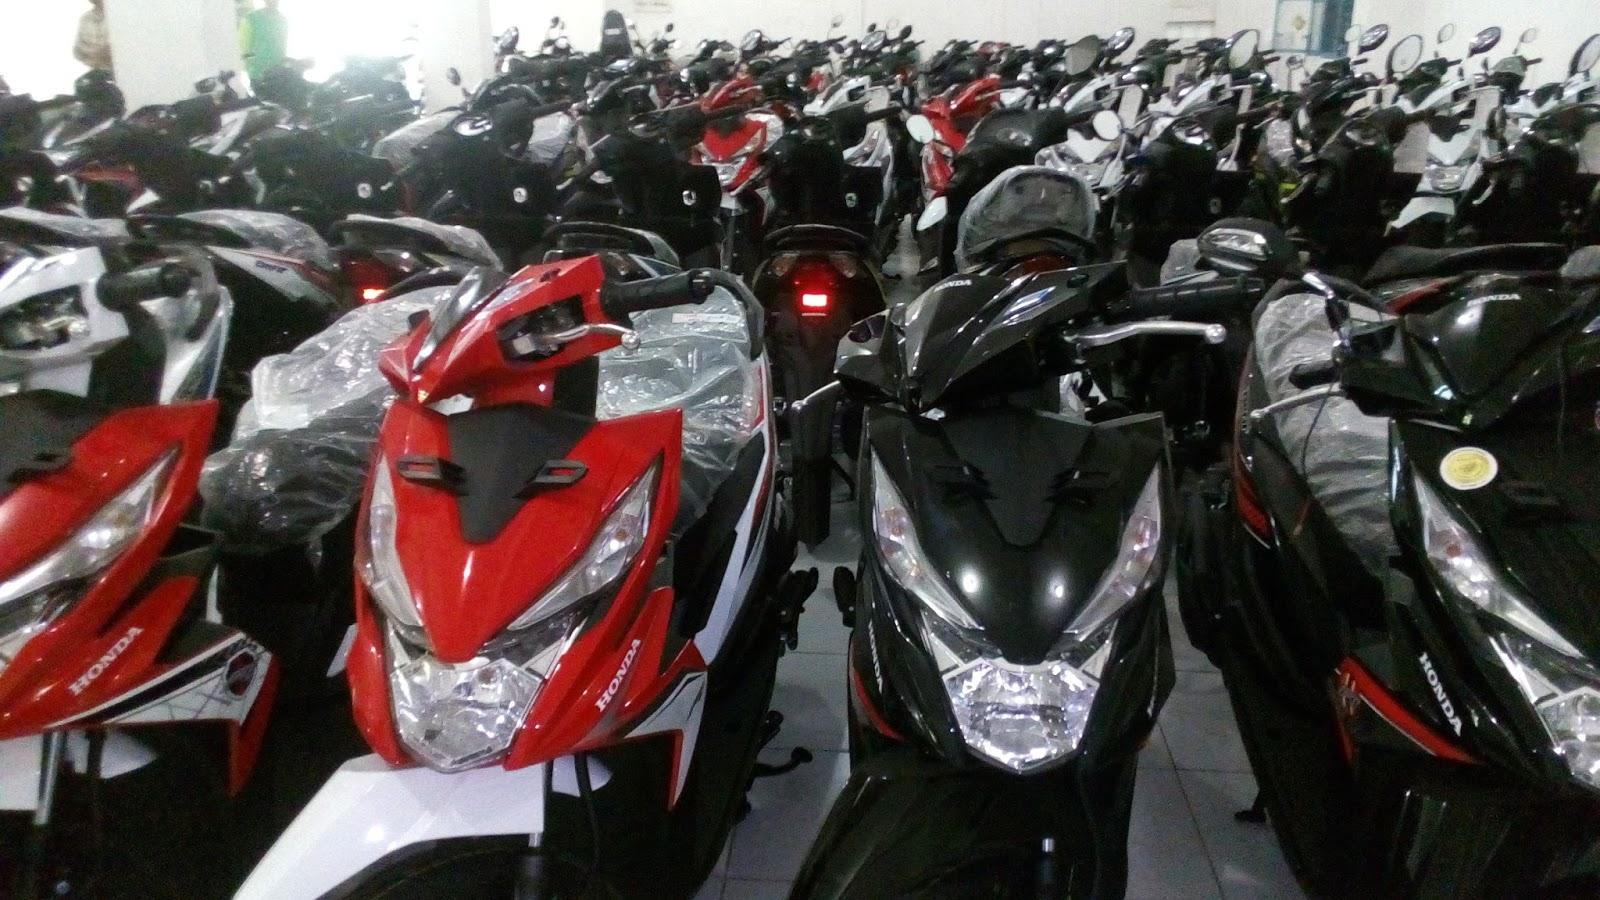 Kredit Sepeda Motor Honda Di Solo Promo Murah New Beat Street Esp Black Cilacap Harga Scoopy Karanganyar Tabel Angsuran Boyolali Dp 500 Program